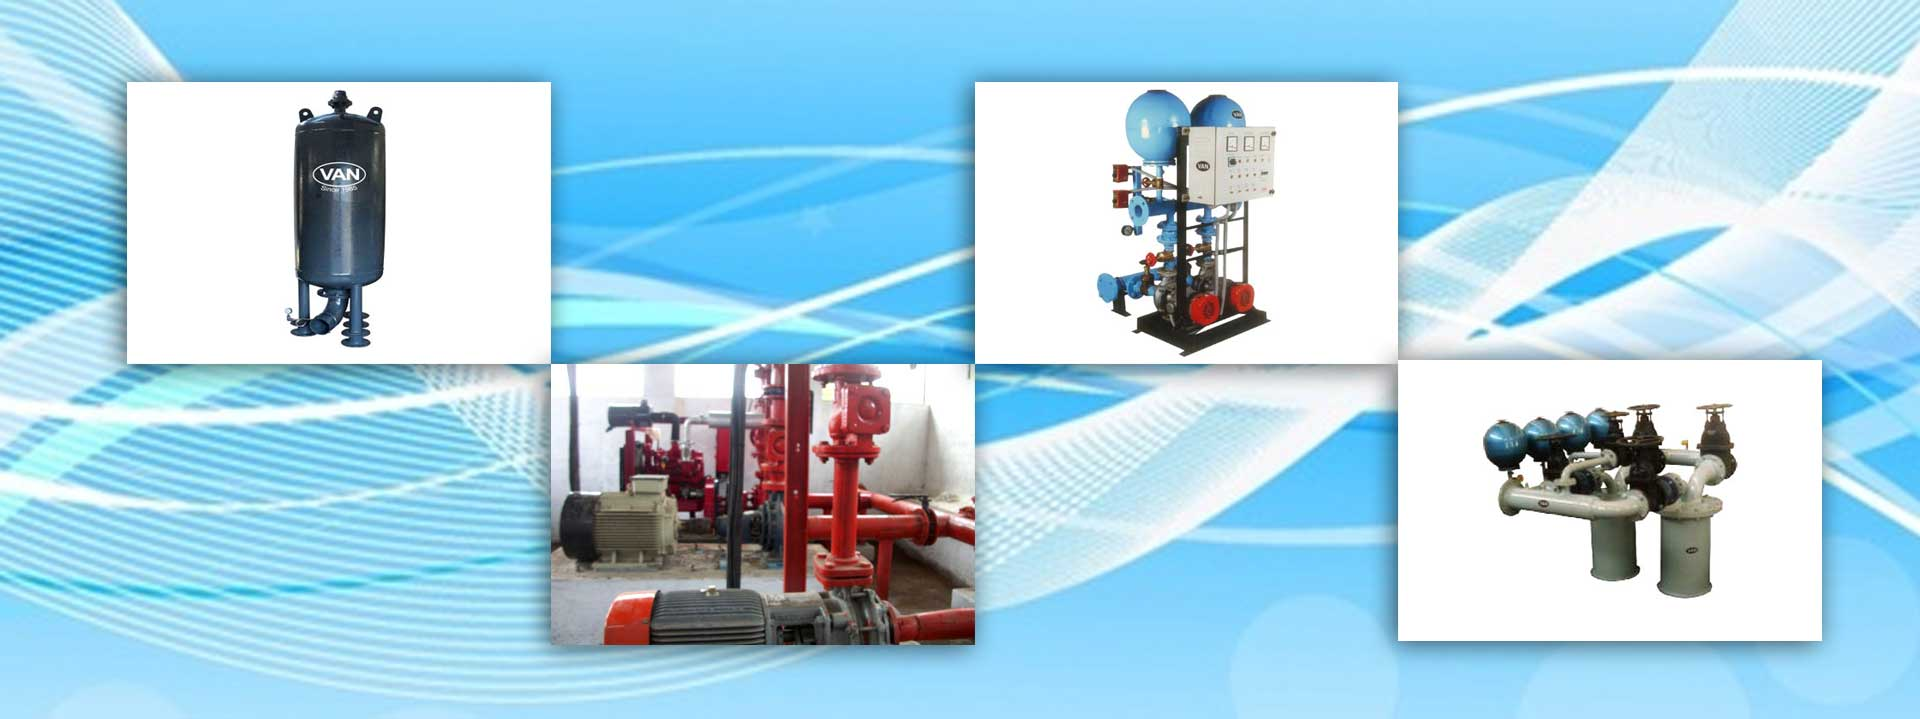 van pumps  control systems pvt  thane mumbai service providers  dealers  pumps